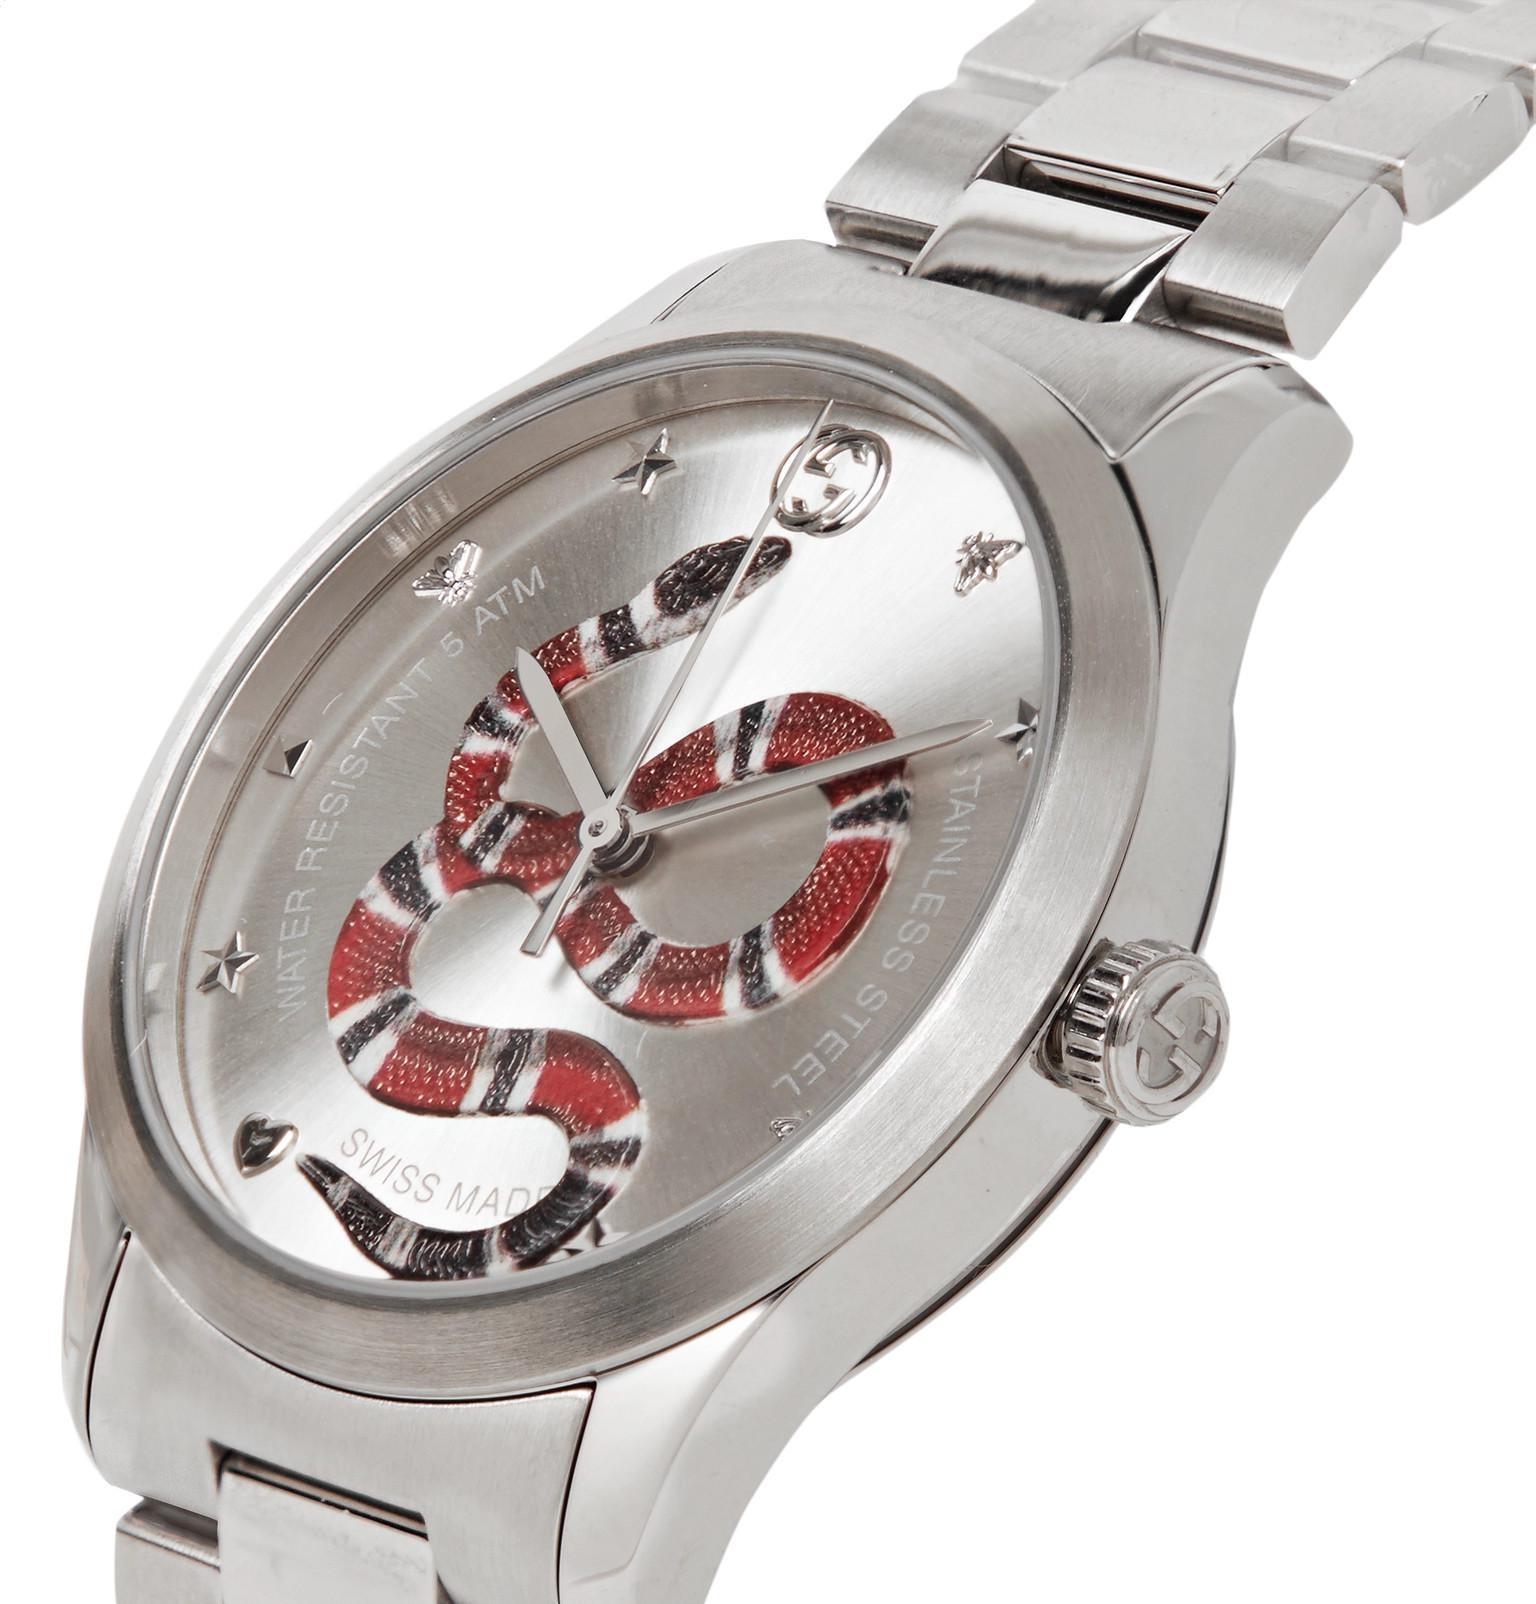 5fbd1f14c68 Gucci - Metallic G-timeless Snake-dial 38mm Stainless Steel Watch for Men  -. View fullscreen